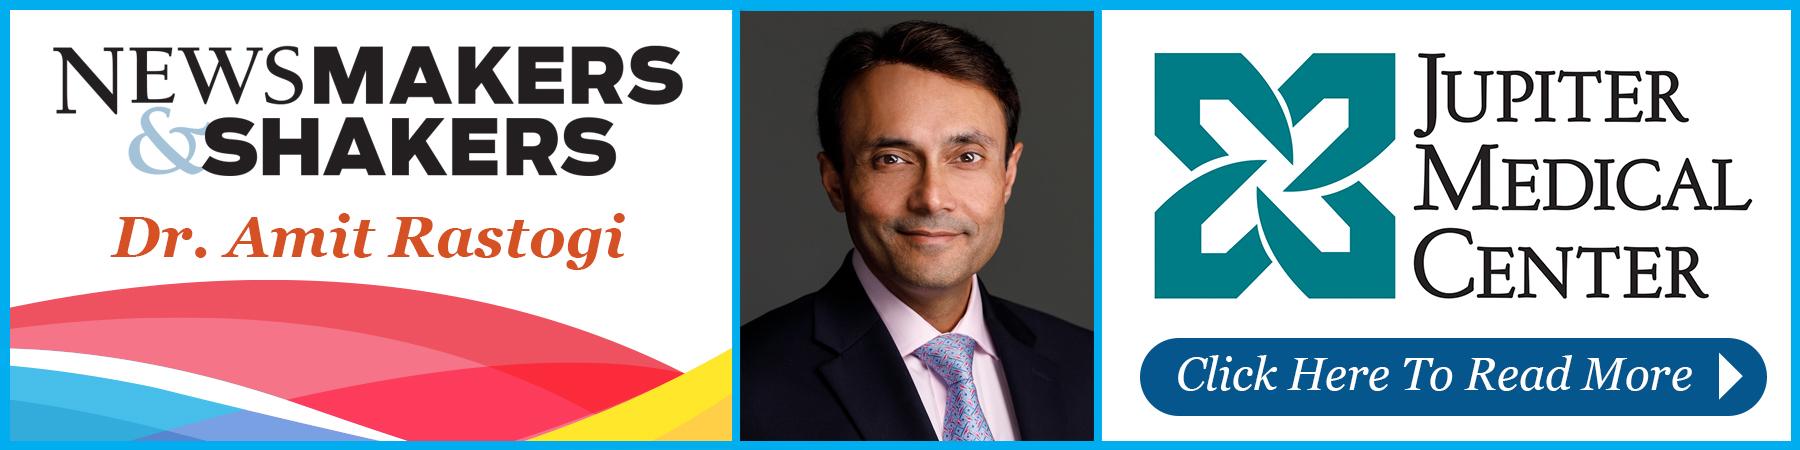 Dr Amit Rastogi_NMS_WebBanner_11-30-2020